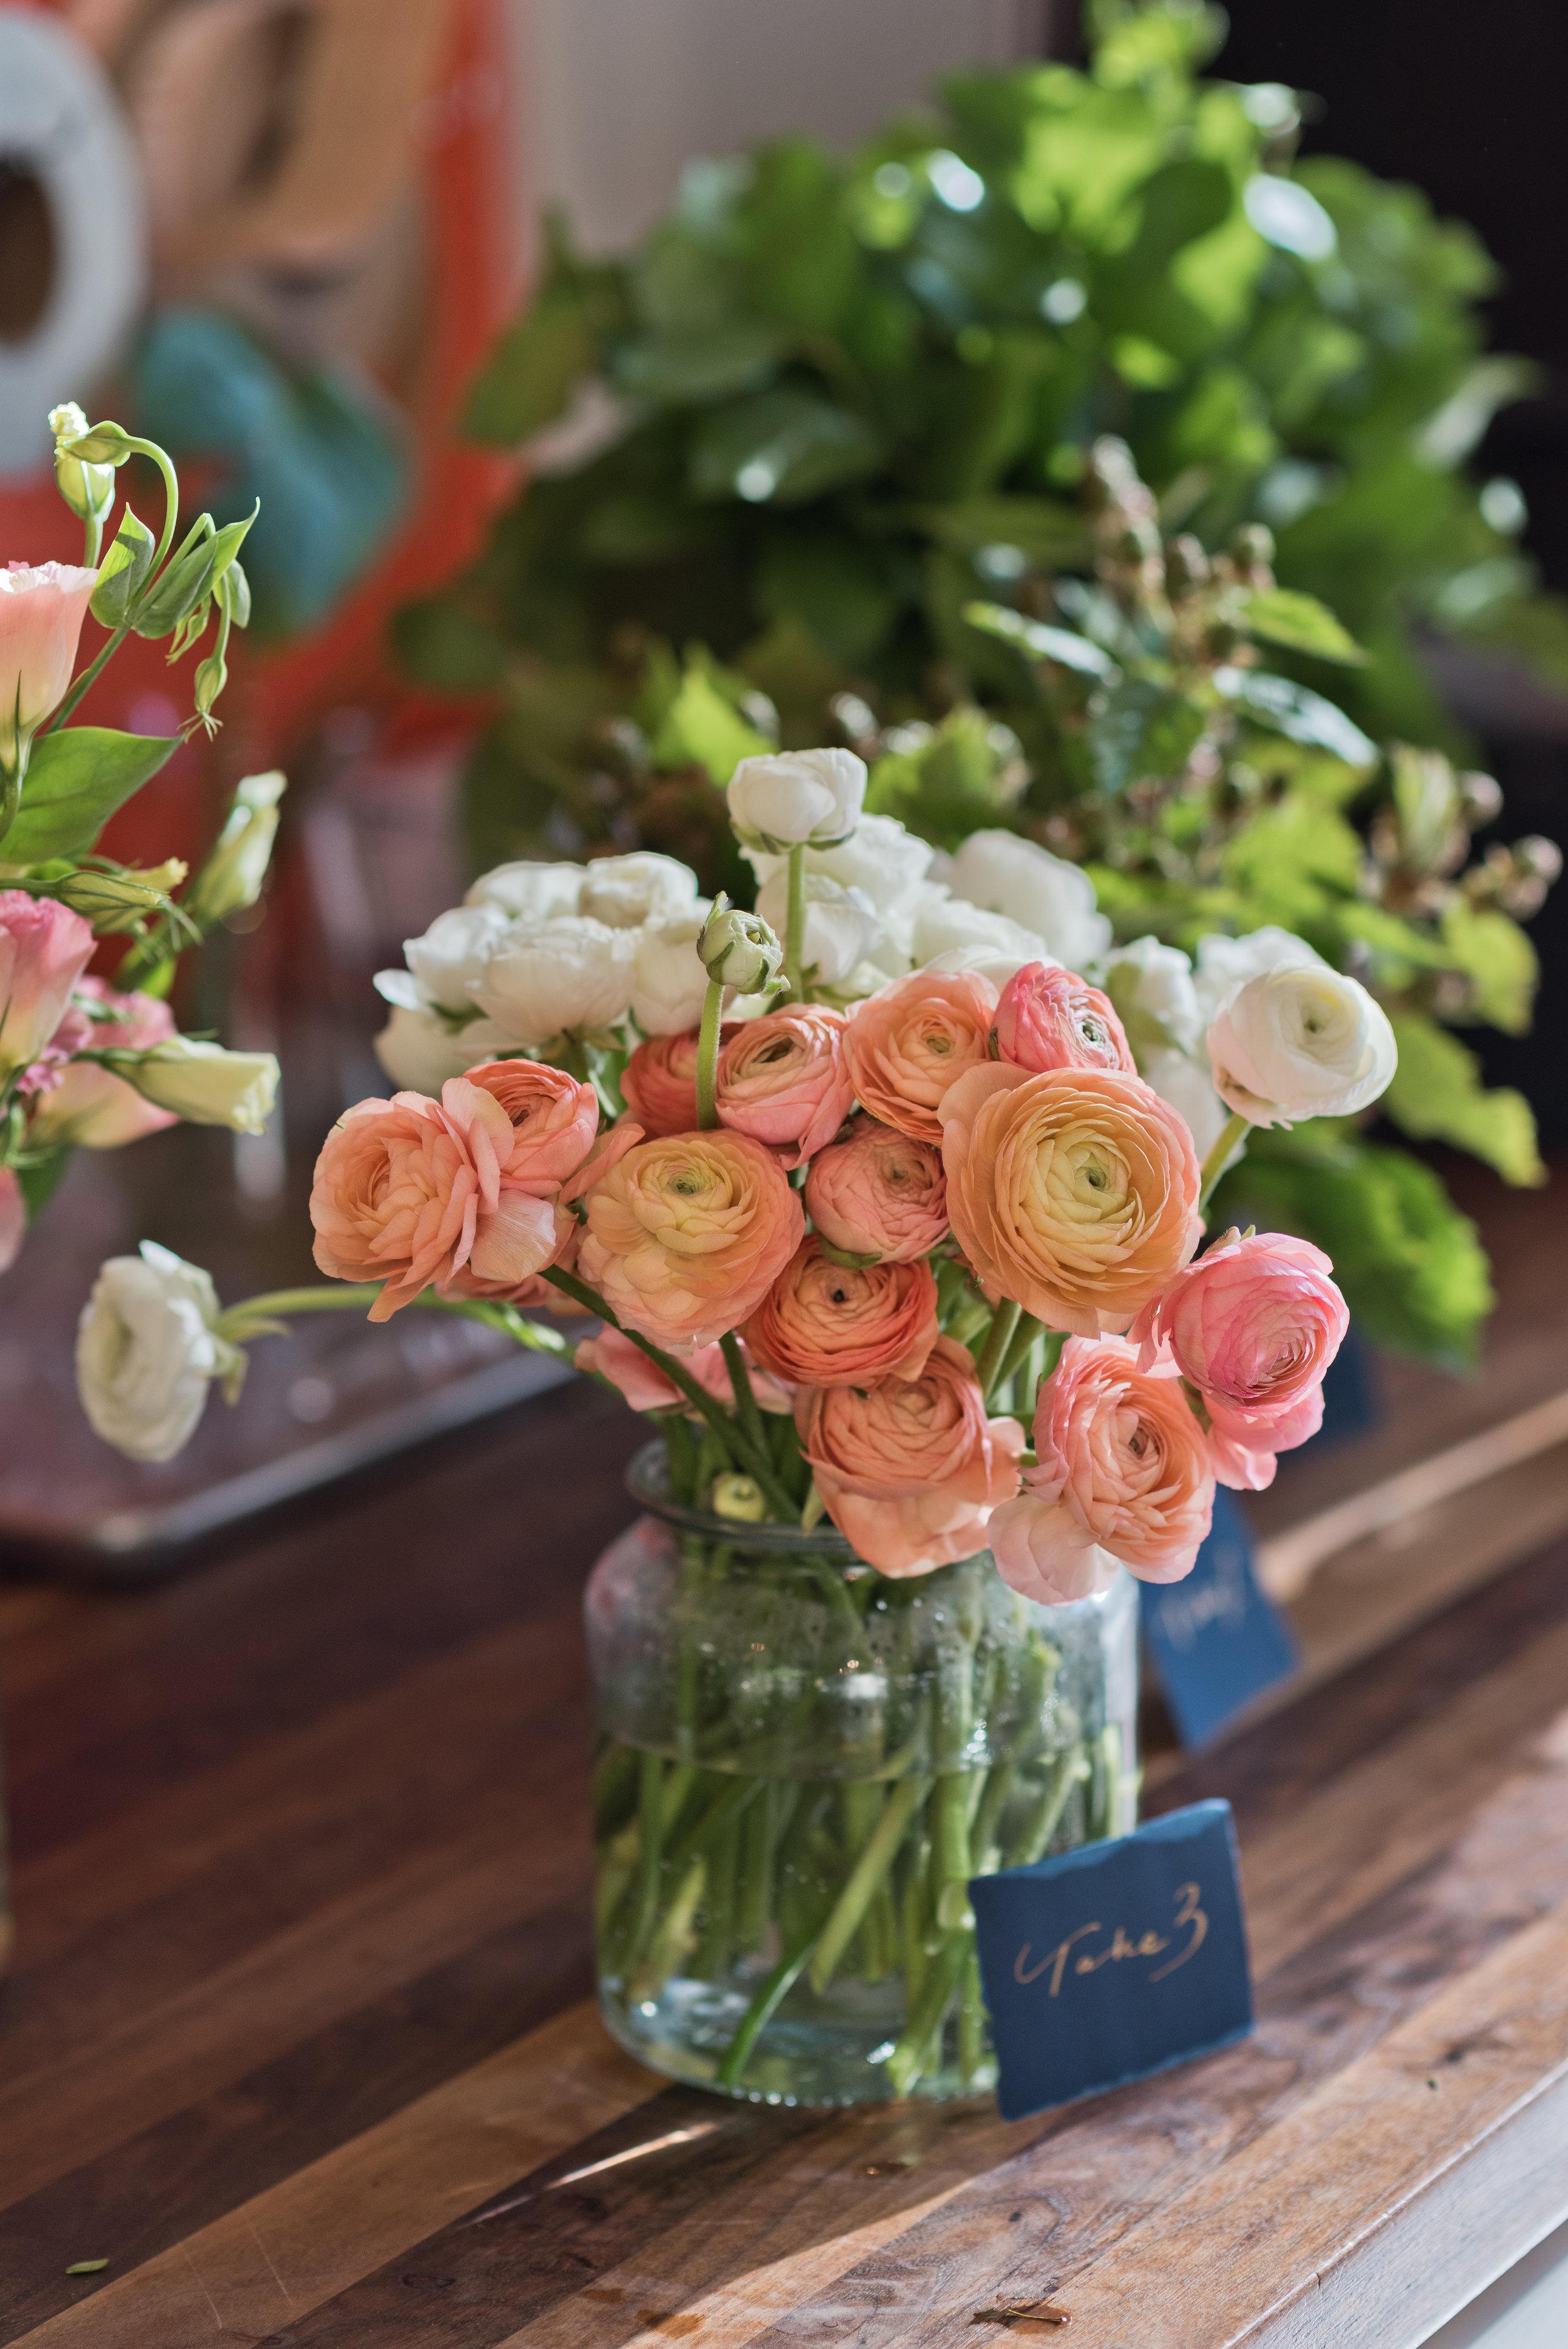 petal-and-fold-candlefish-workshop-july-2018-5.jpg